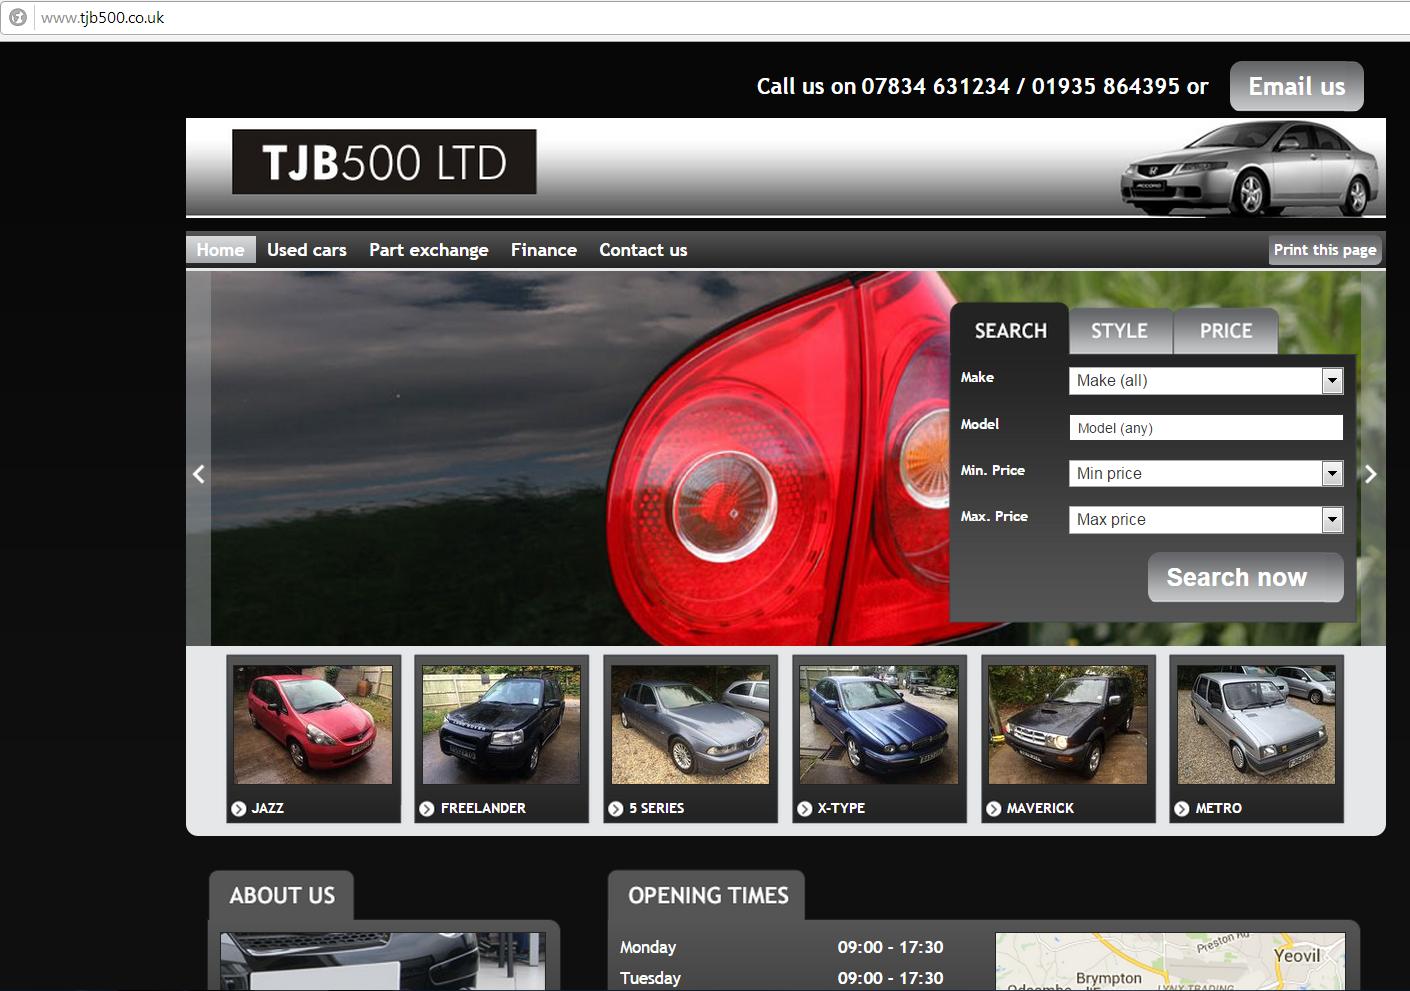 Famous Ebay Motors Uk Used Cars Gallery - Classic Cars Ideas - boiq.info